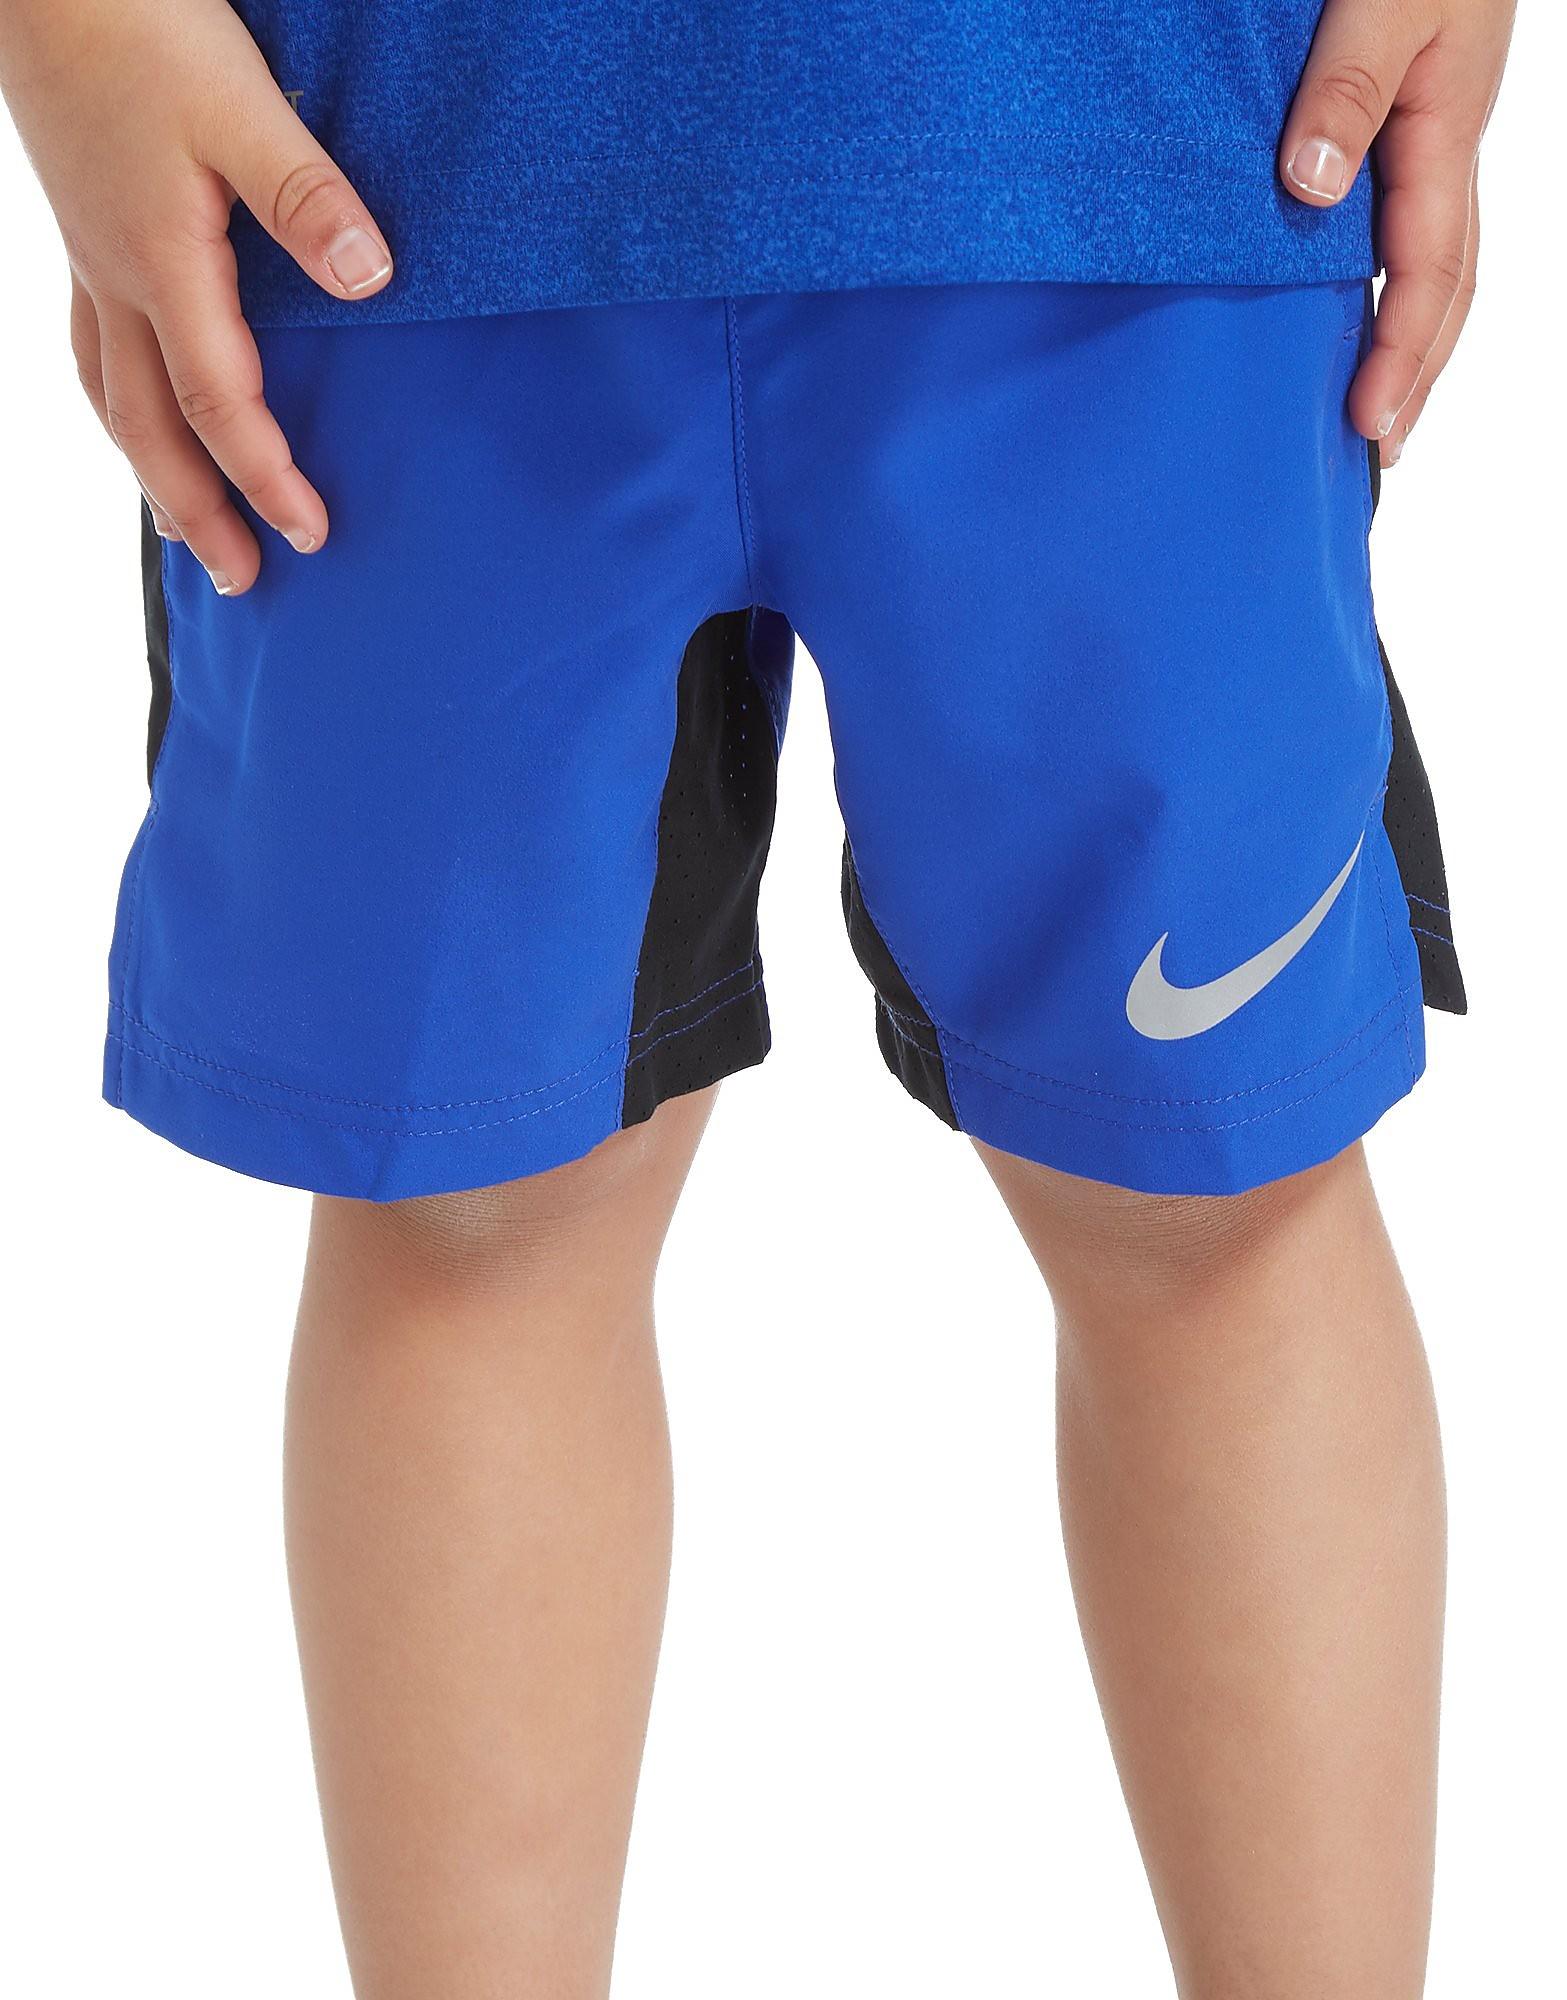 Nike Woven Running Shorts Children